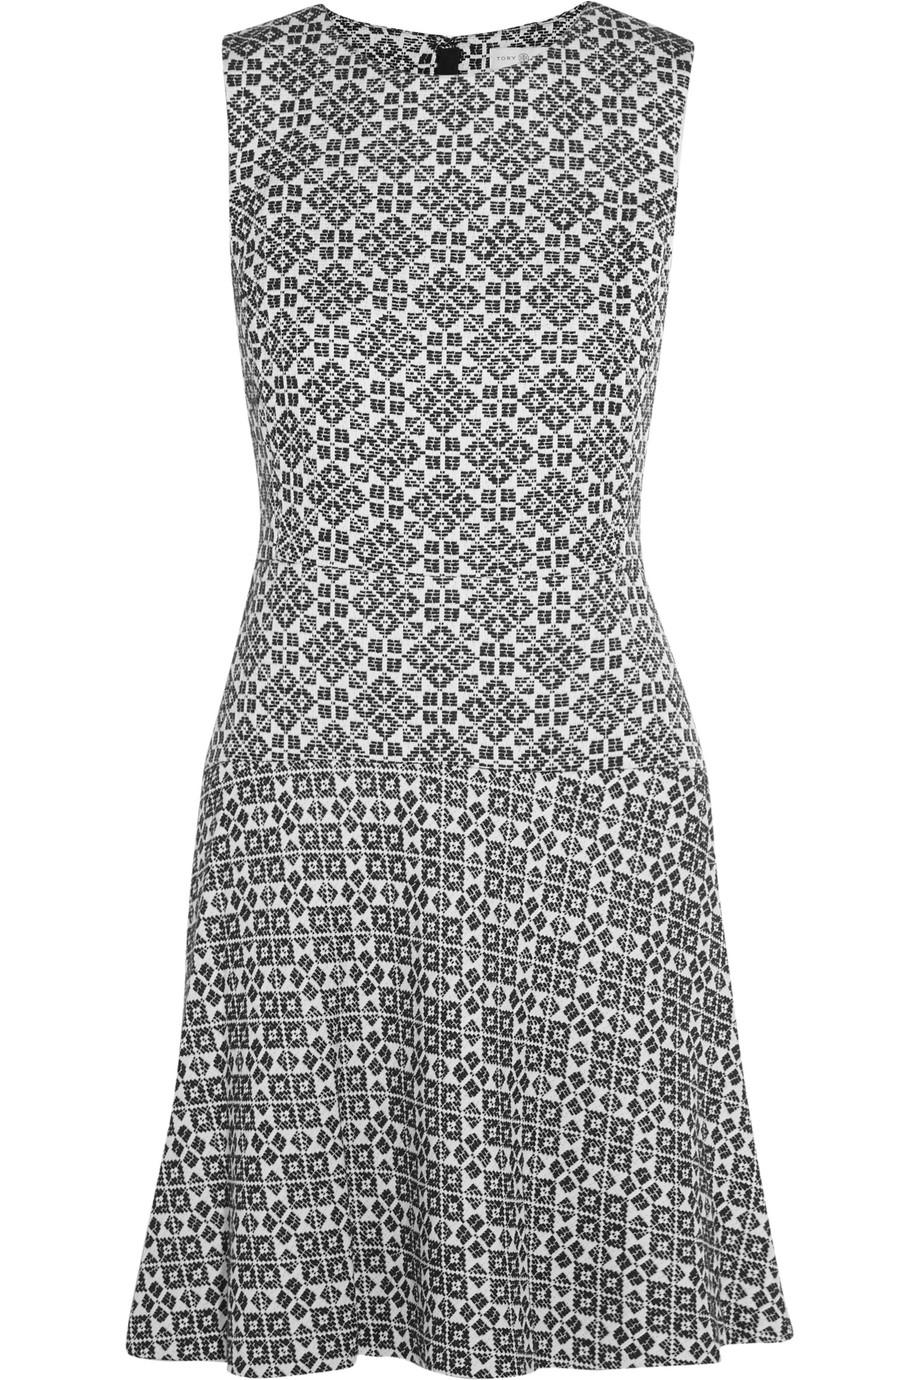 Tory Burch Cotton-Blend Jacquard Mini Dress, Midnight Blue, Women's - Jacquard, Size: 6